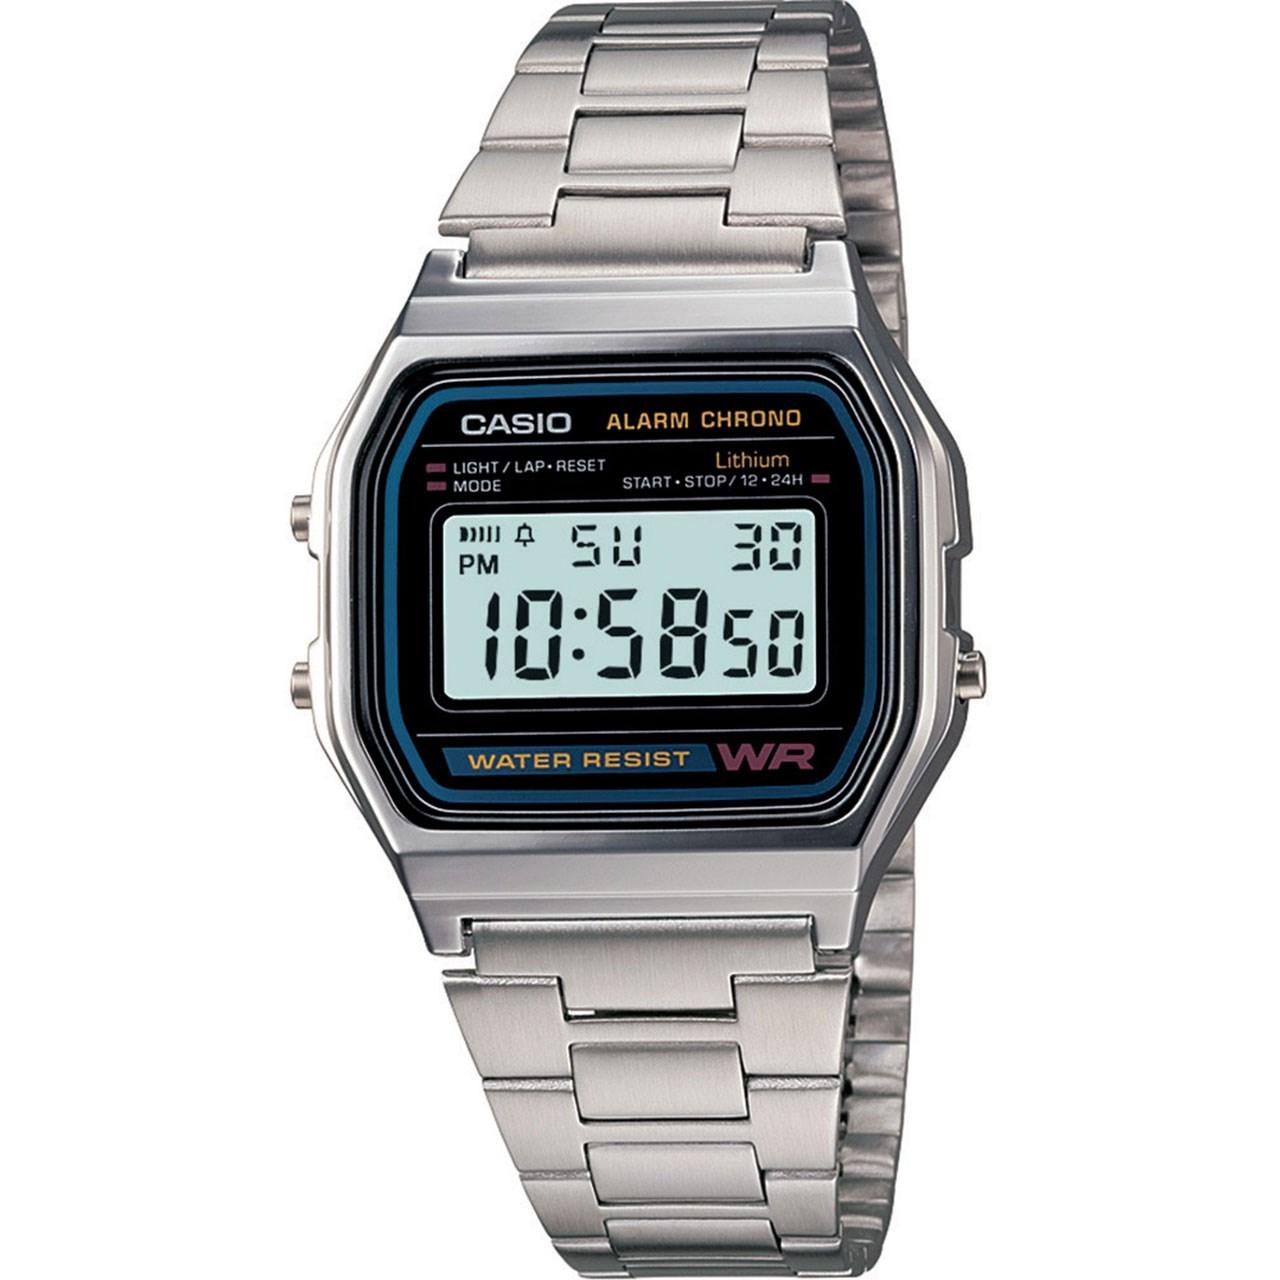 ساعت مچی دیجیتالی کاسیو مدل A158WA-1DF